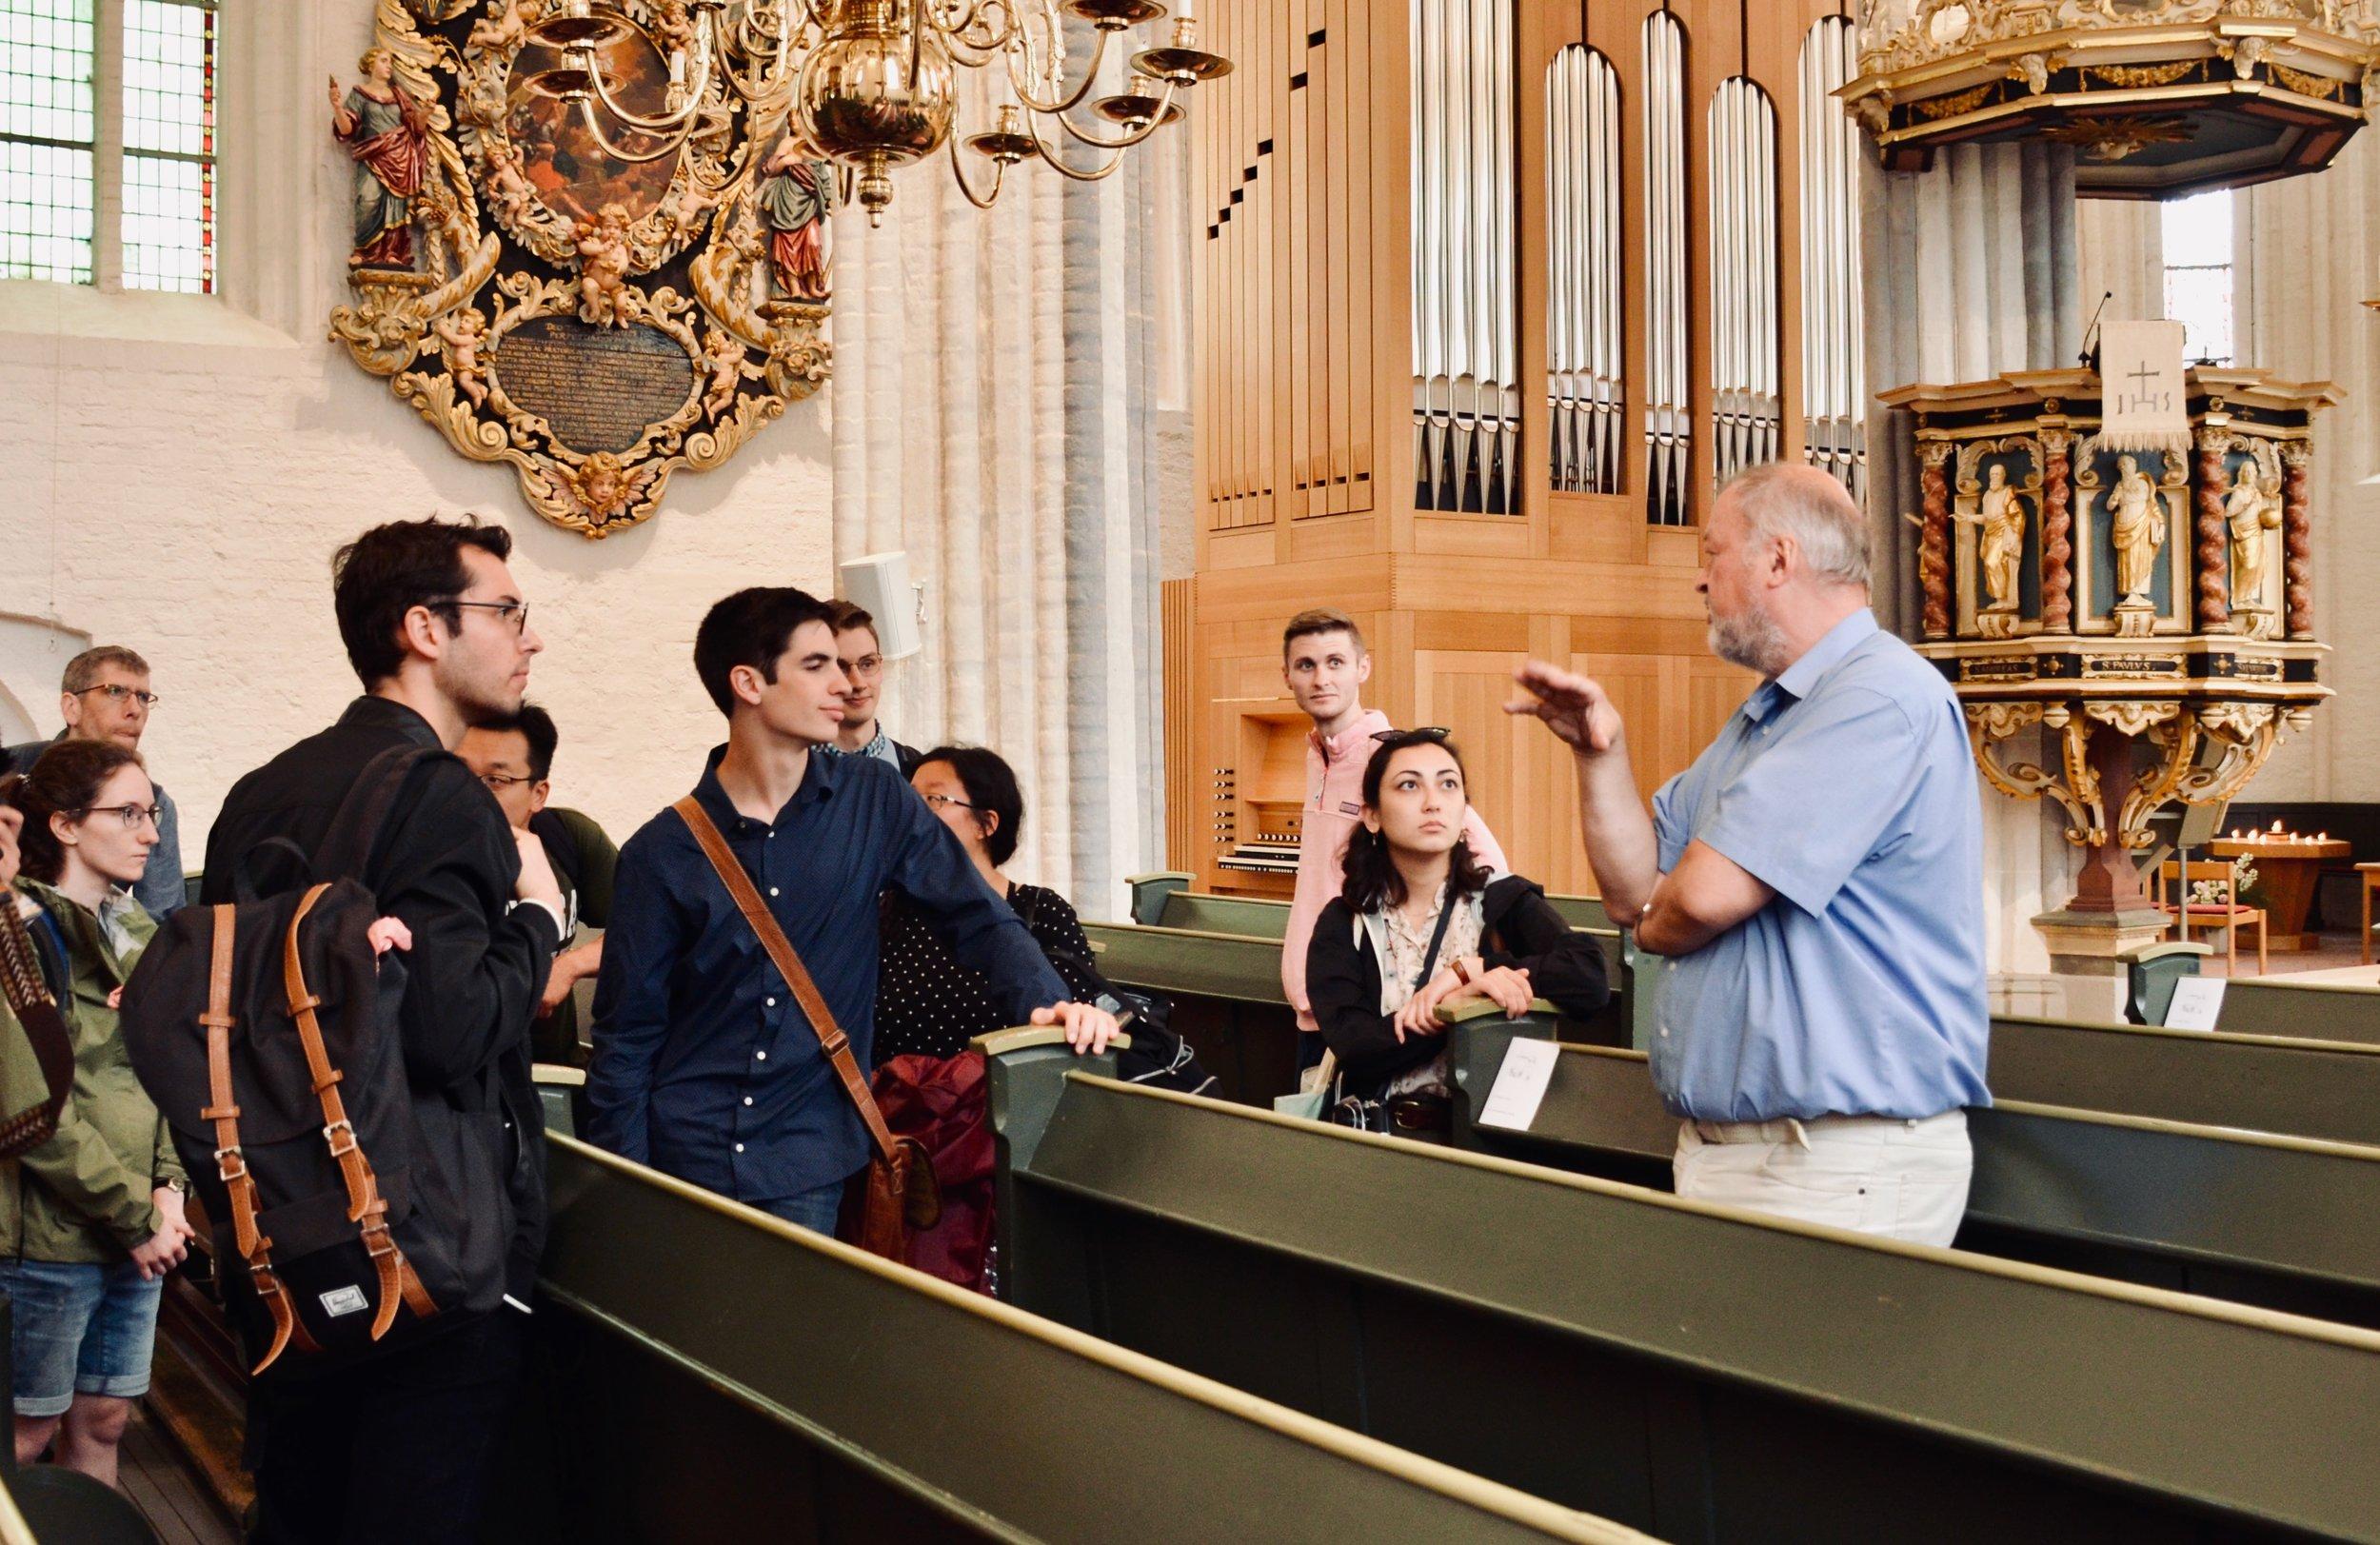 Prof. Marin Böcker introduces the 1736 Bielfeldt organ in St. Wilhaldi, Stade. Boston Organ Studio.